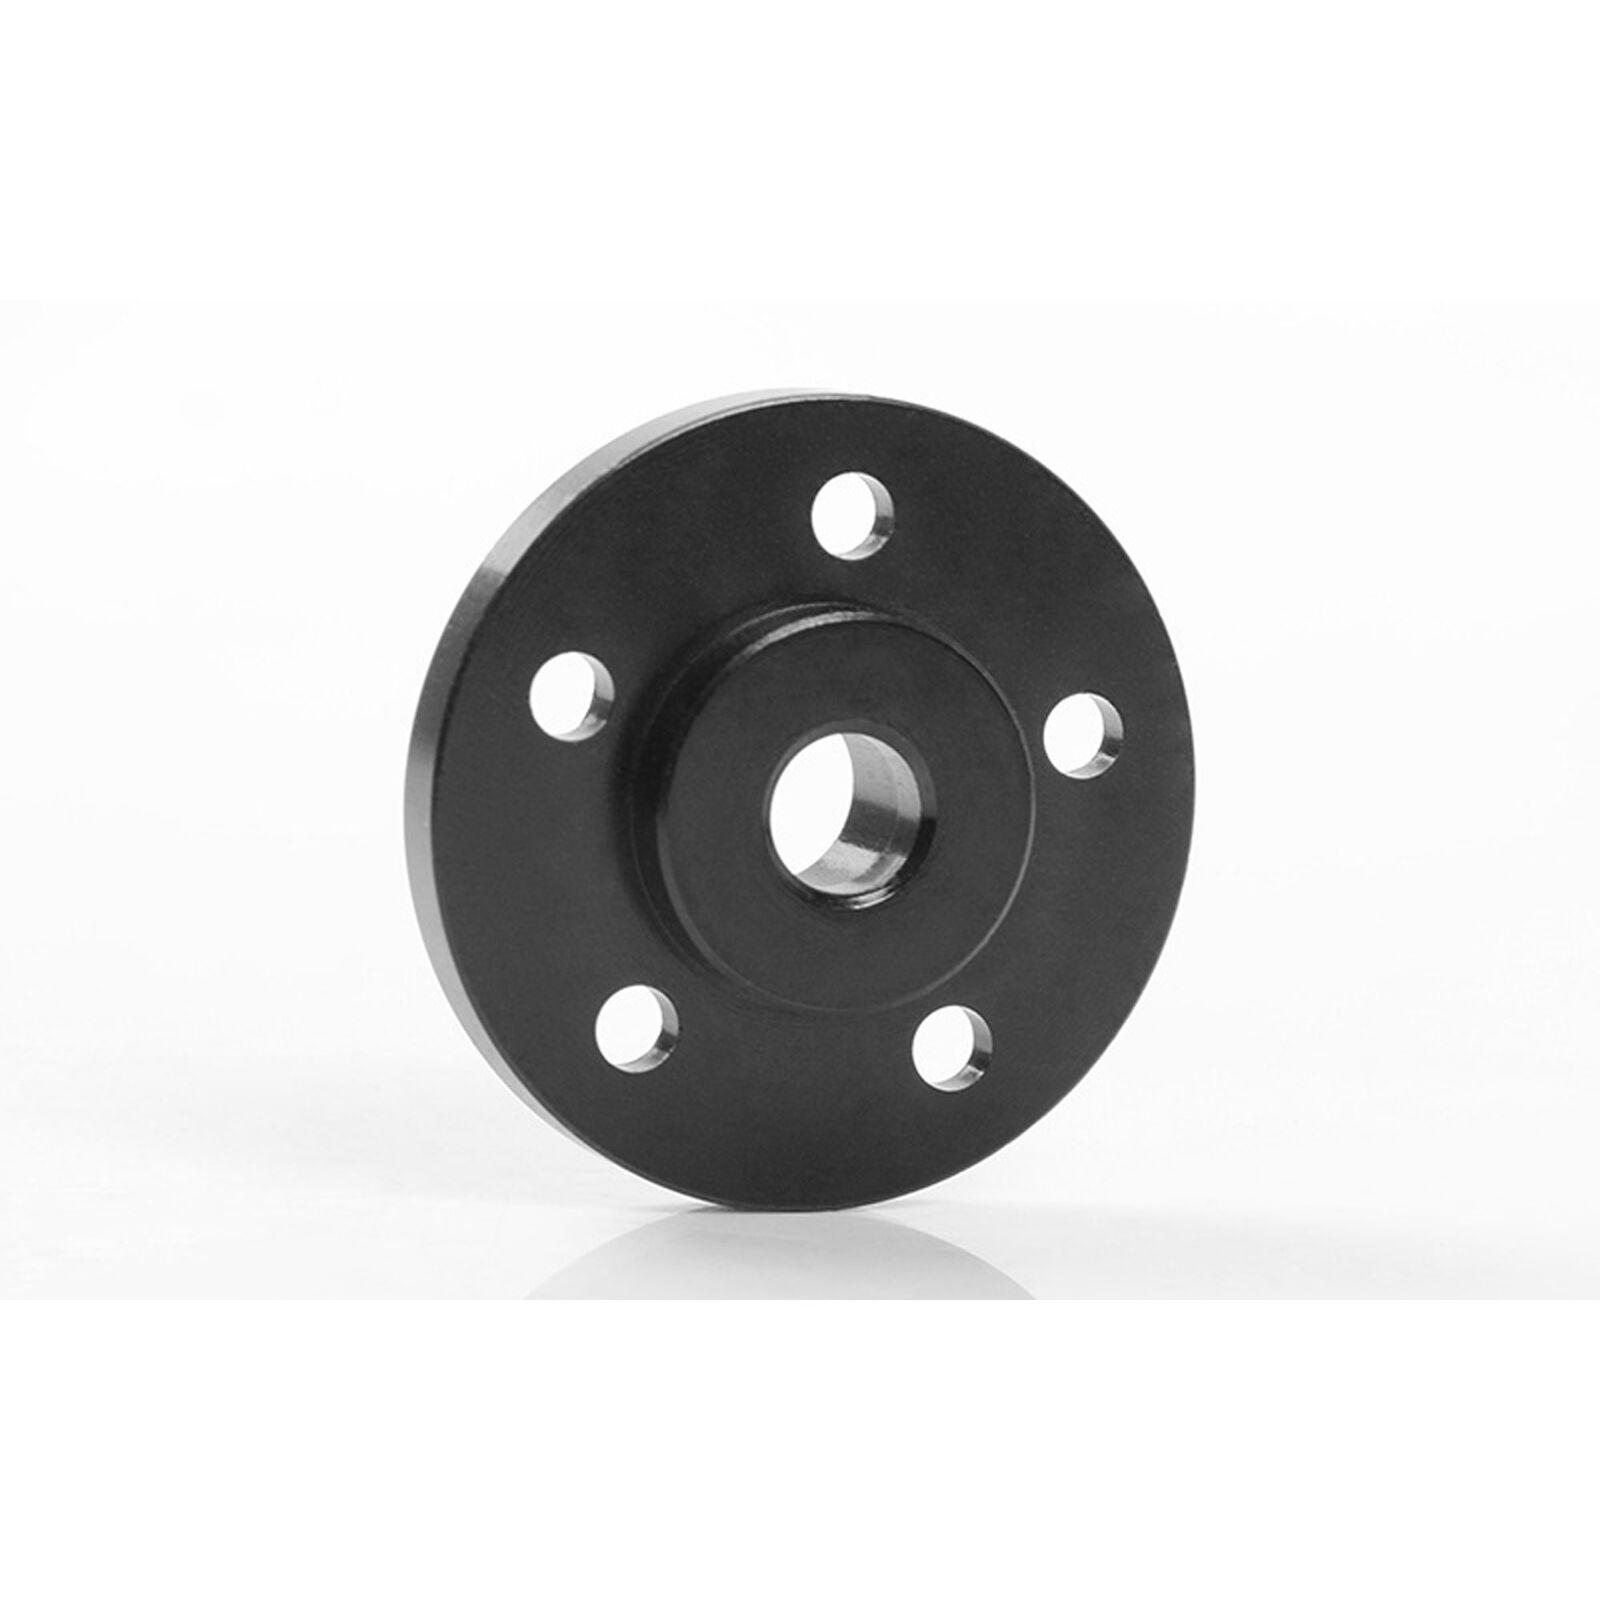 "Narrow SS Wheel Pin Mount, 5-Lug for 1.55"" Landies Wheels"